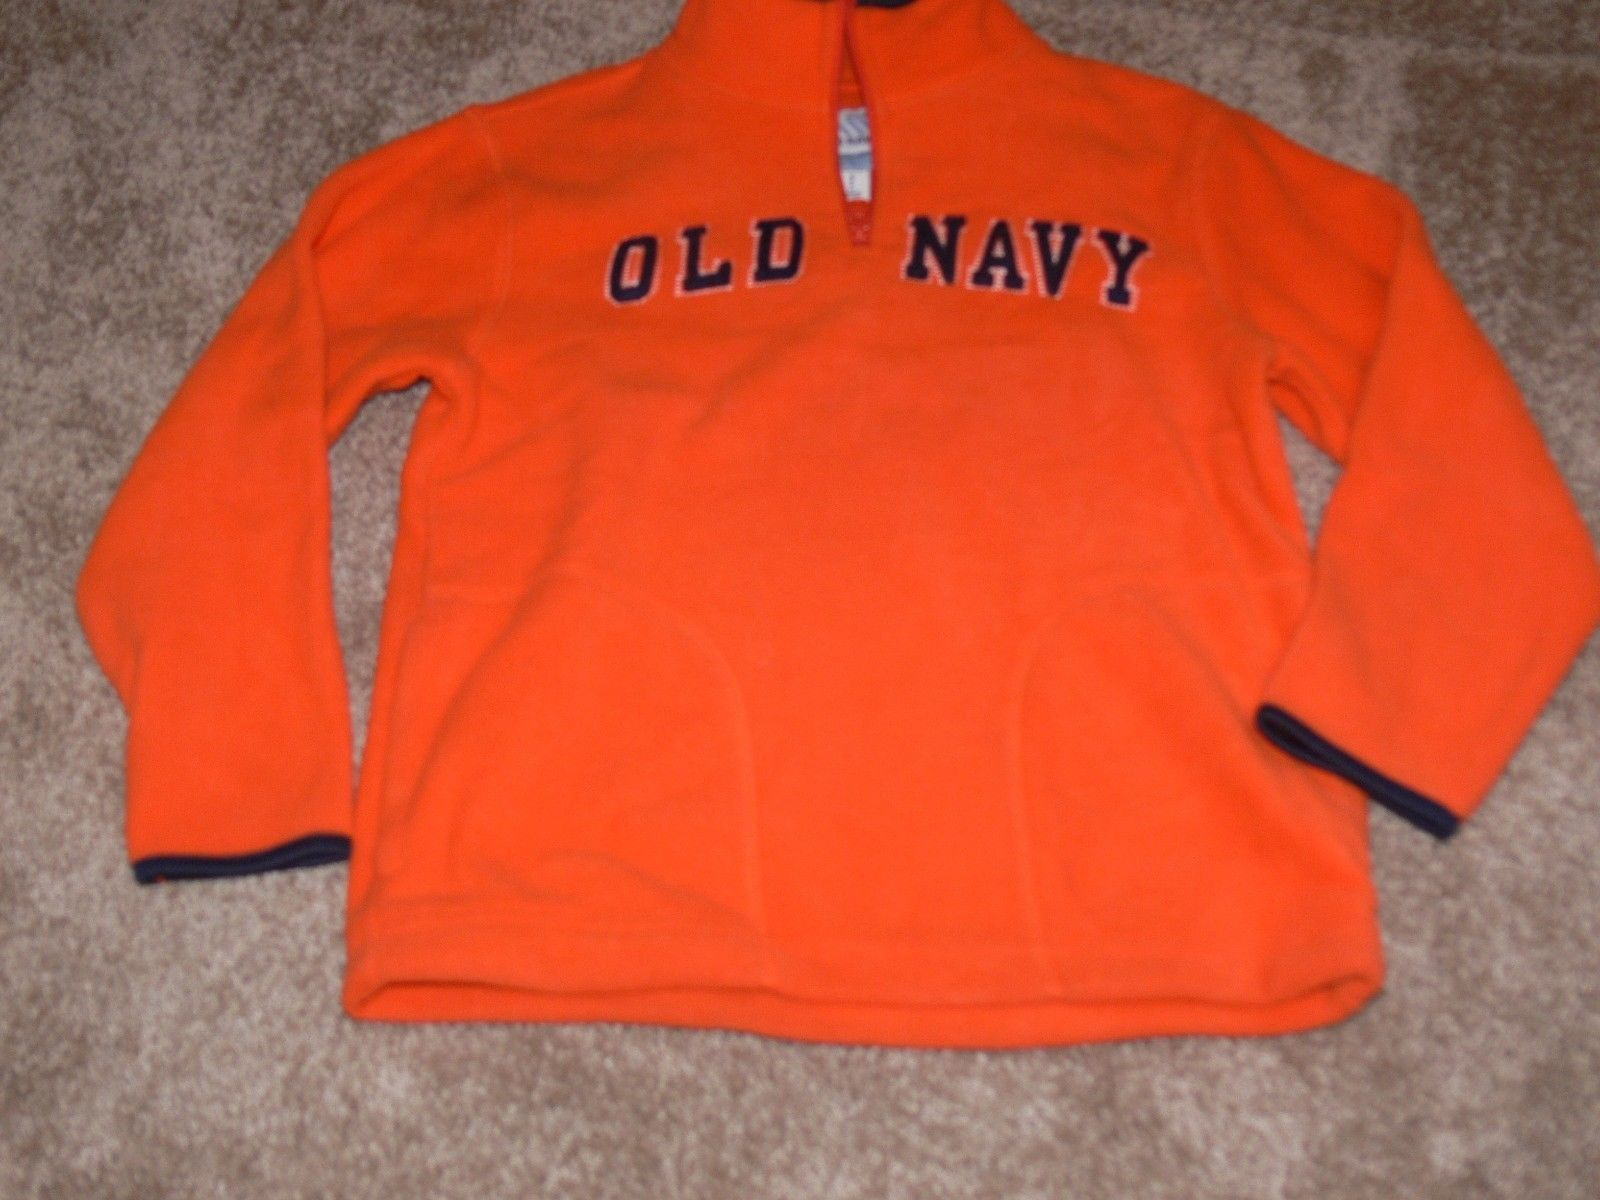 OLD NAVY RED FLEECE BOYS 1//4 ZIP SWEATSHIRT 6-7 NWT SIZE SMALL